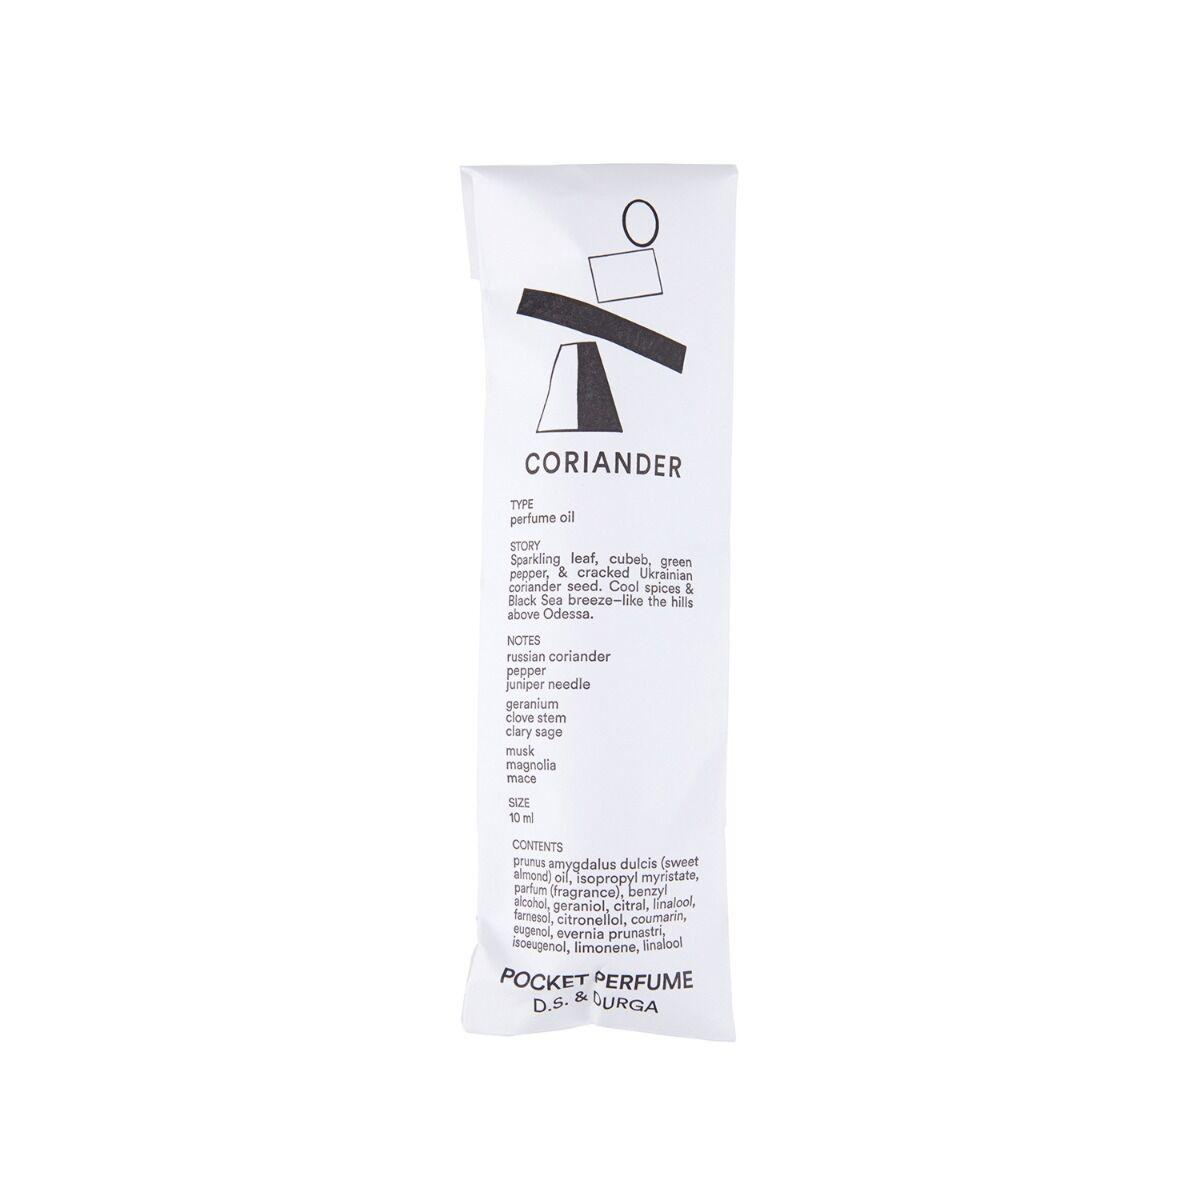 Coriander Pocket Perfume Roller image